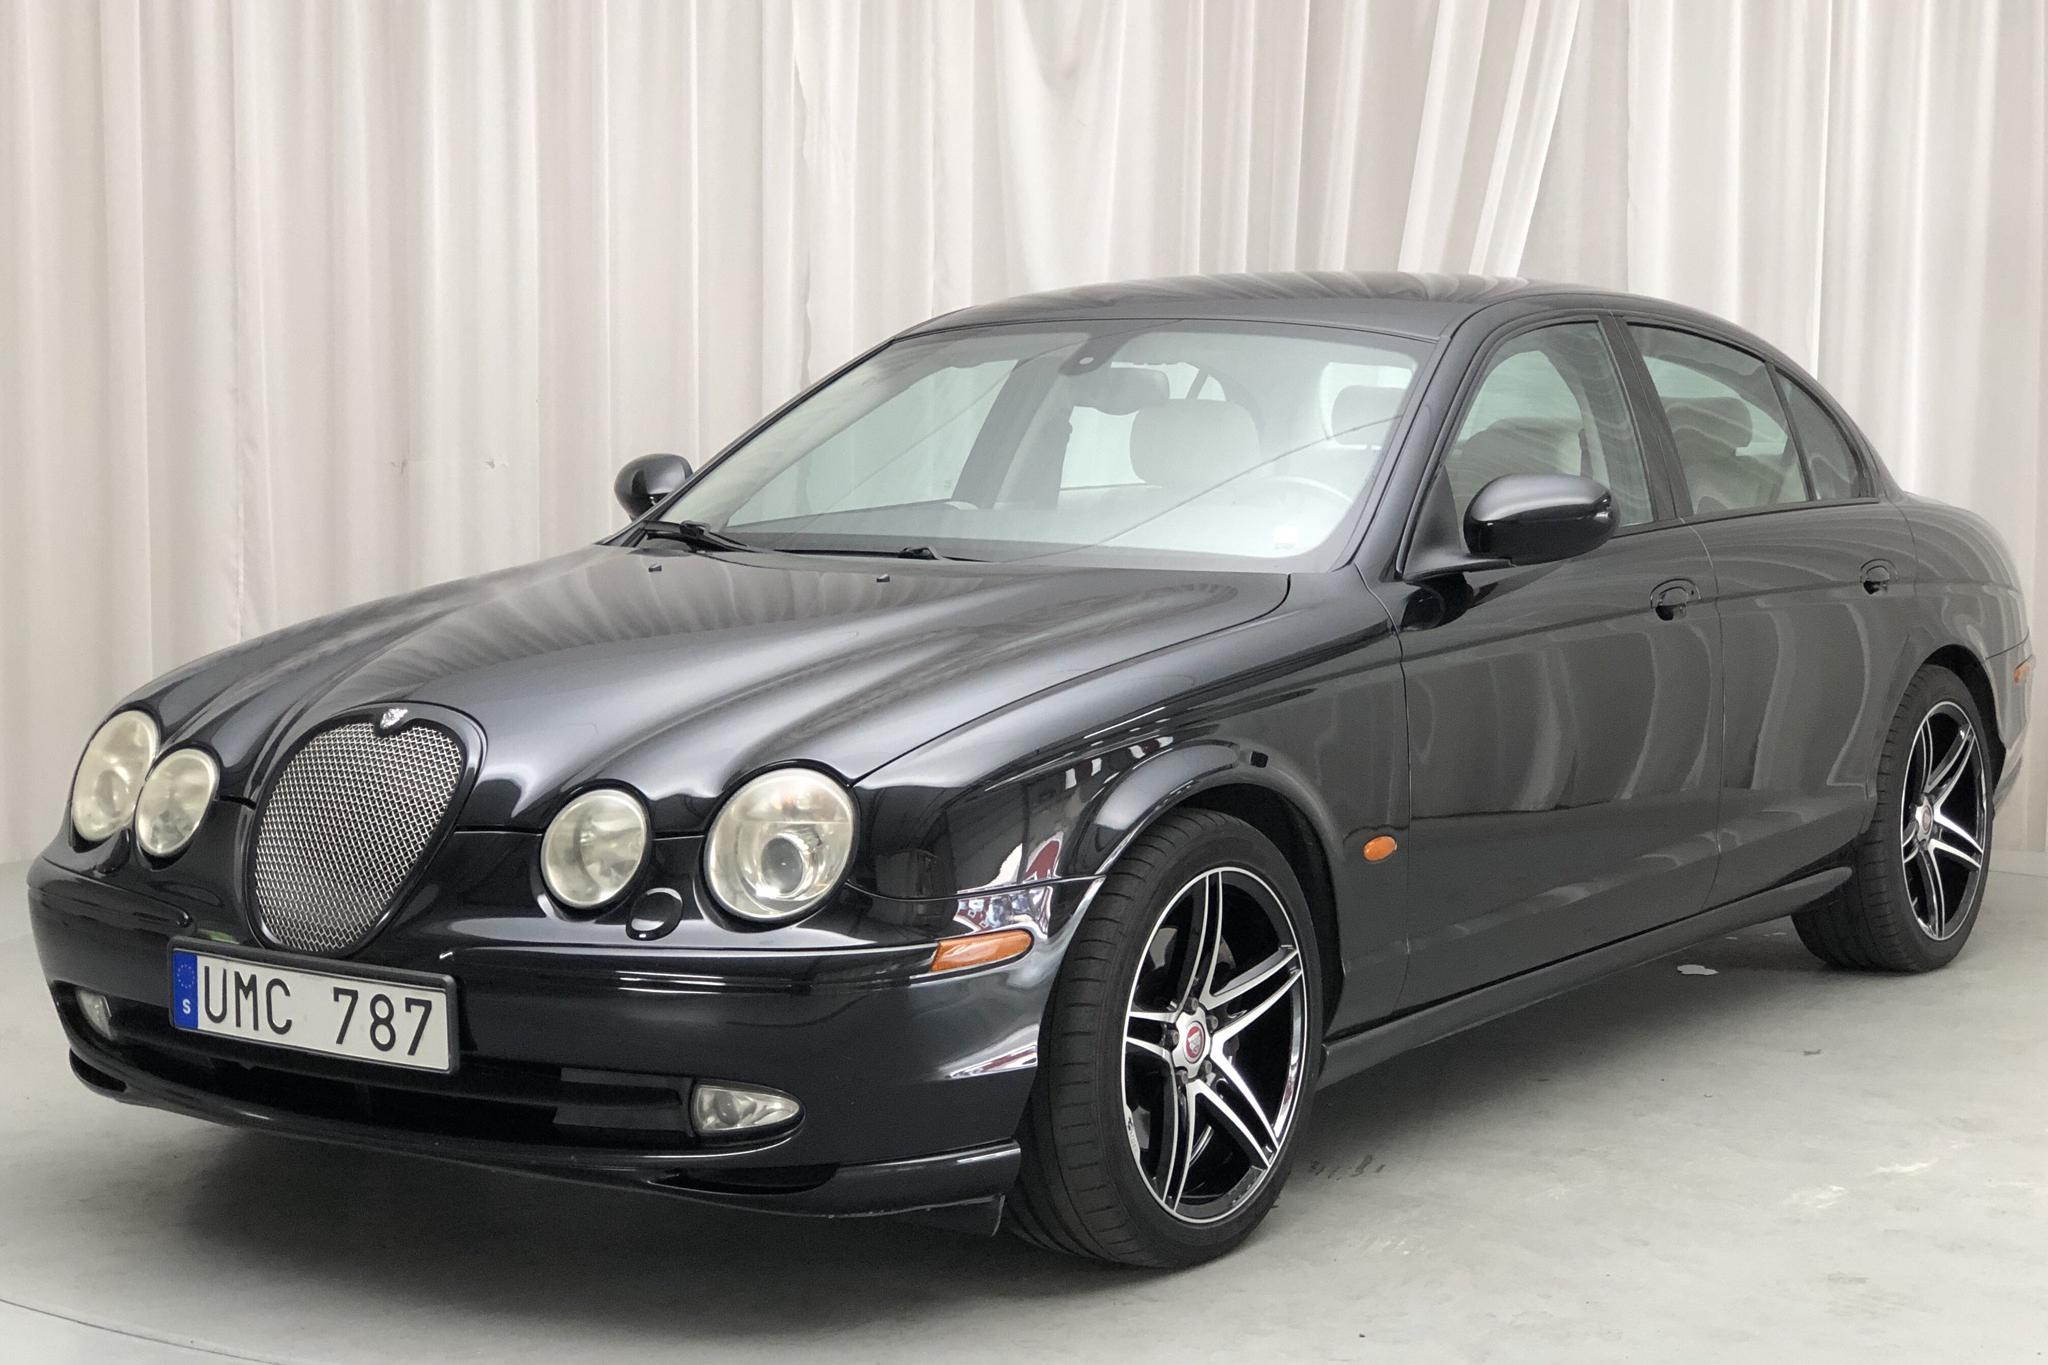 Jaguar S-type 3.0 V6 (240hk) - 213 350 km - Automatic - 2004